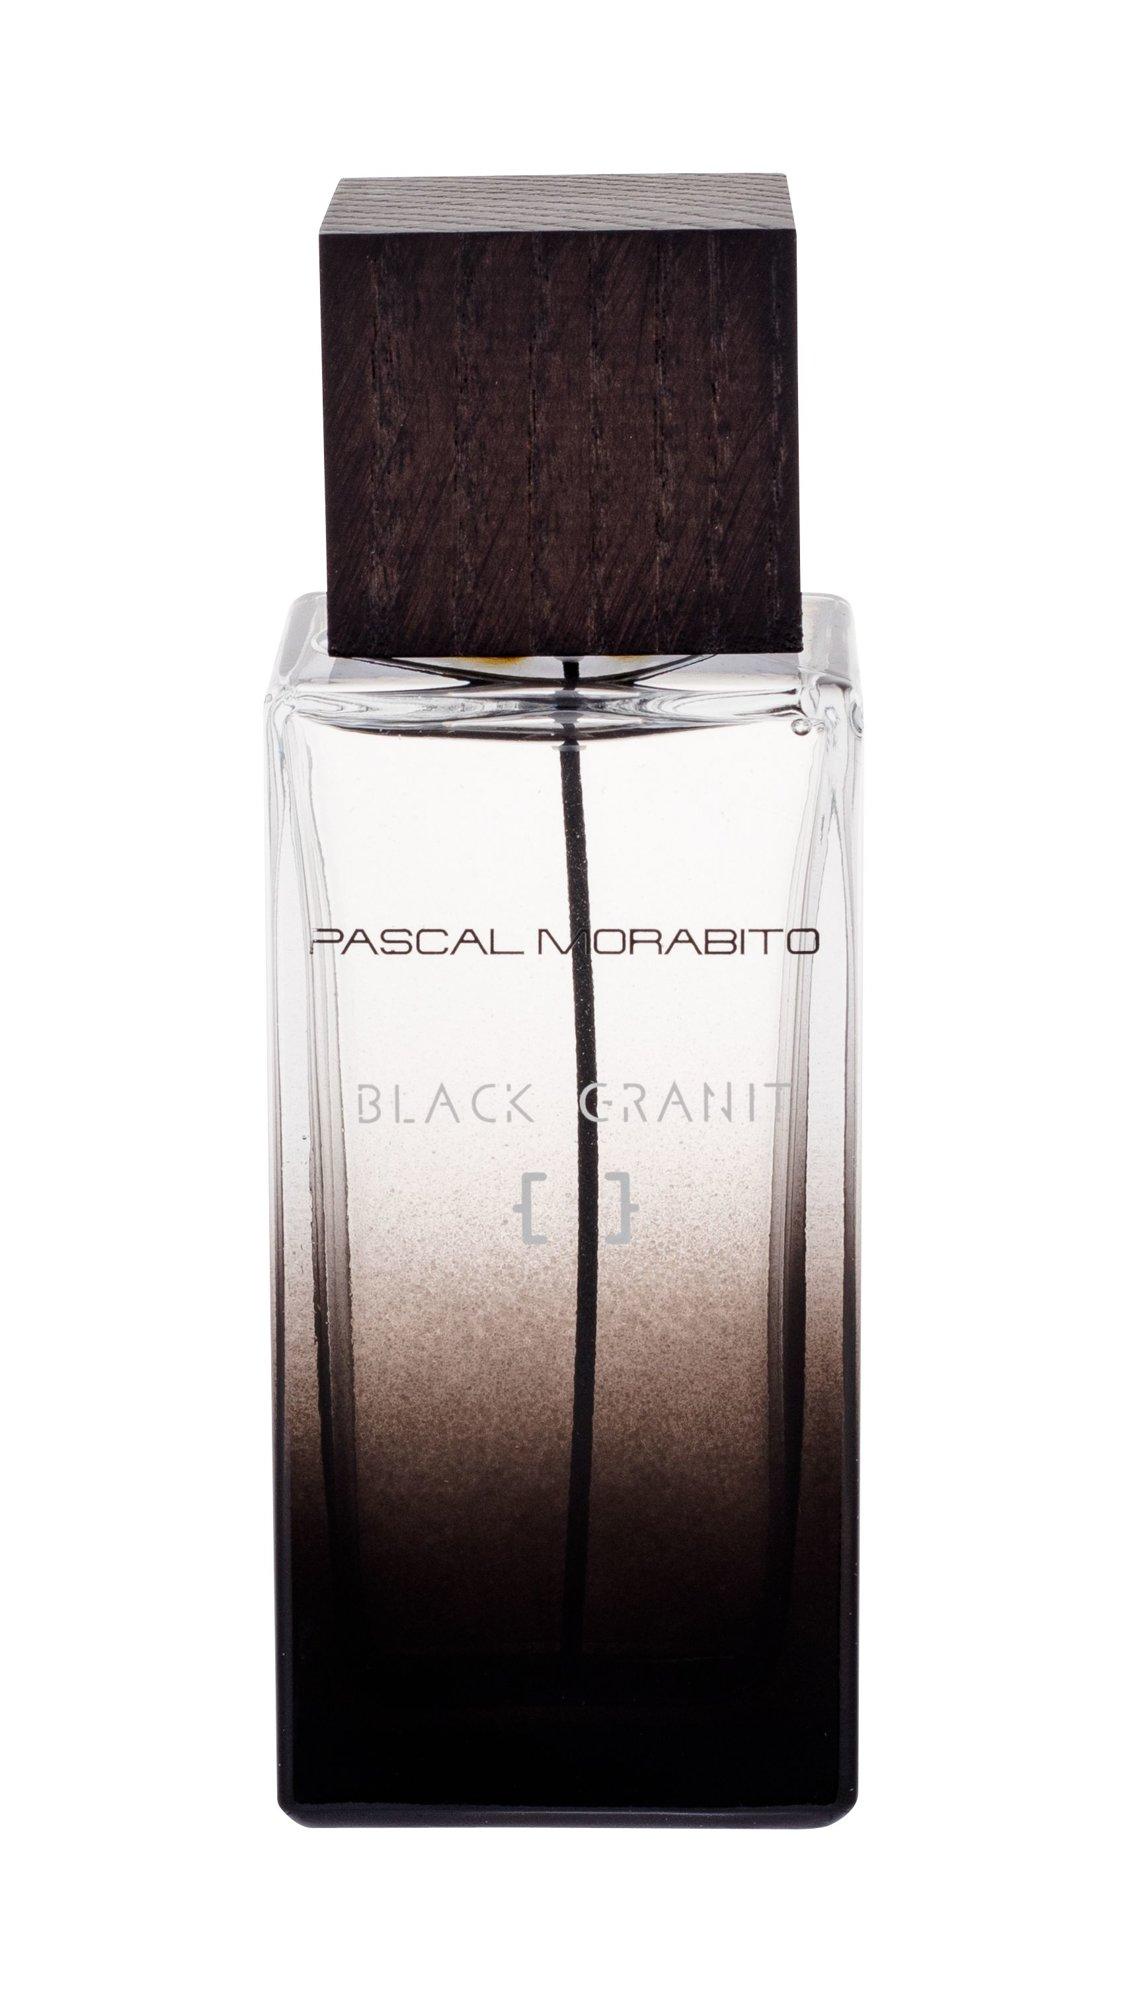 Pascal Morabito Black Granit Eau de Toilette 100ml